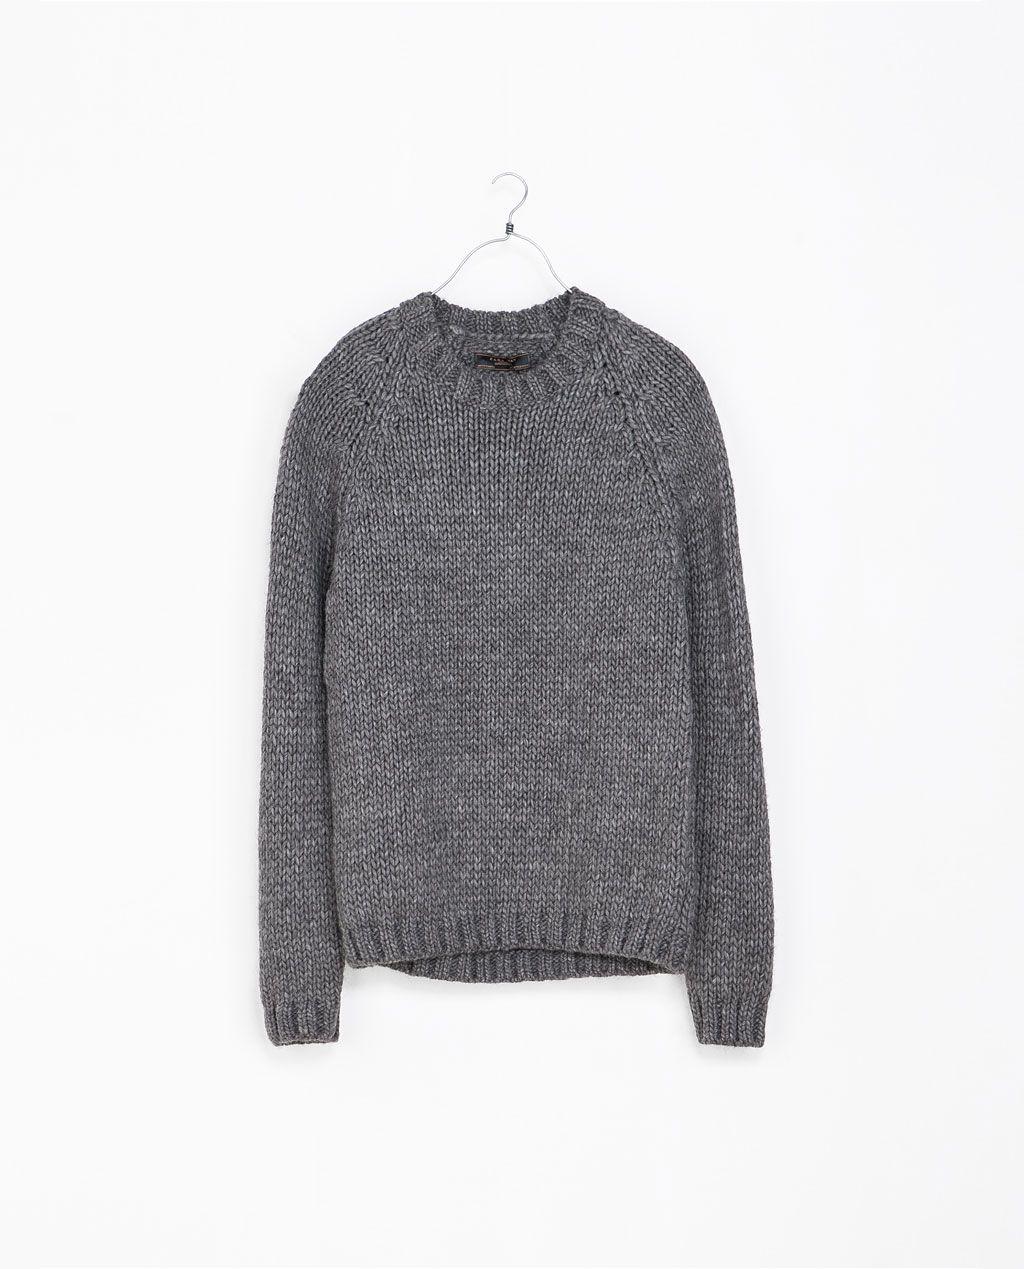 Grof Gebreide Heren Trui.Zara Heren Grof Gebreide Trui Kniting Sweaters Men Sweater